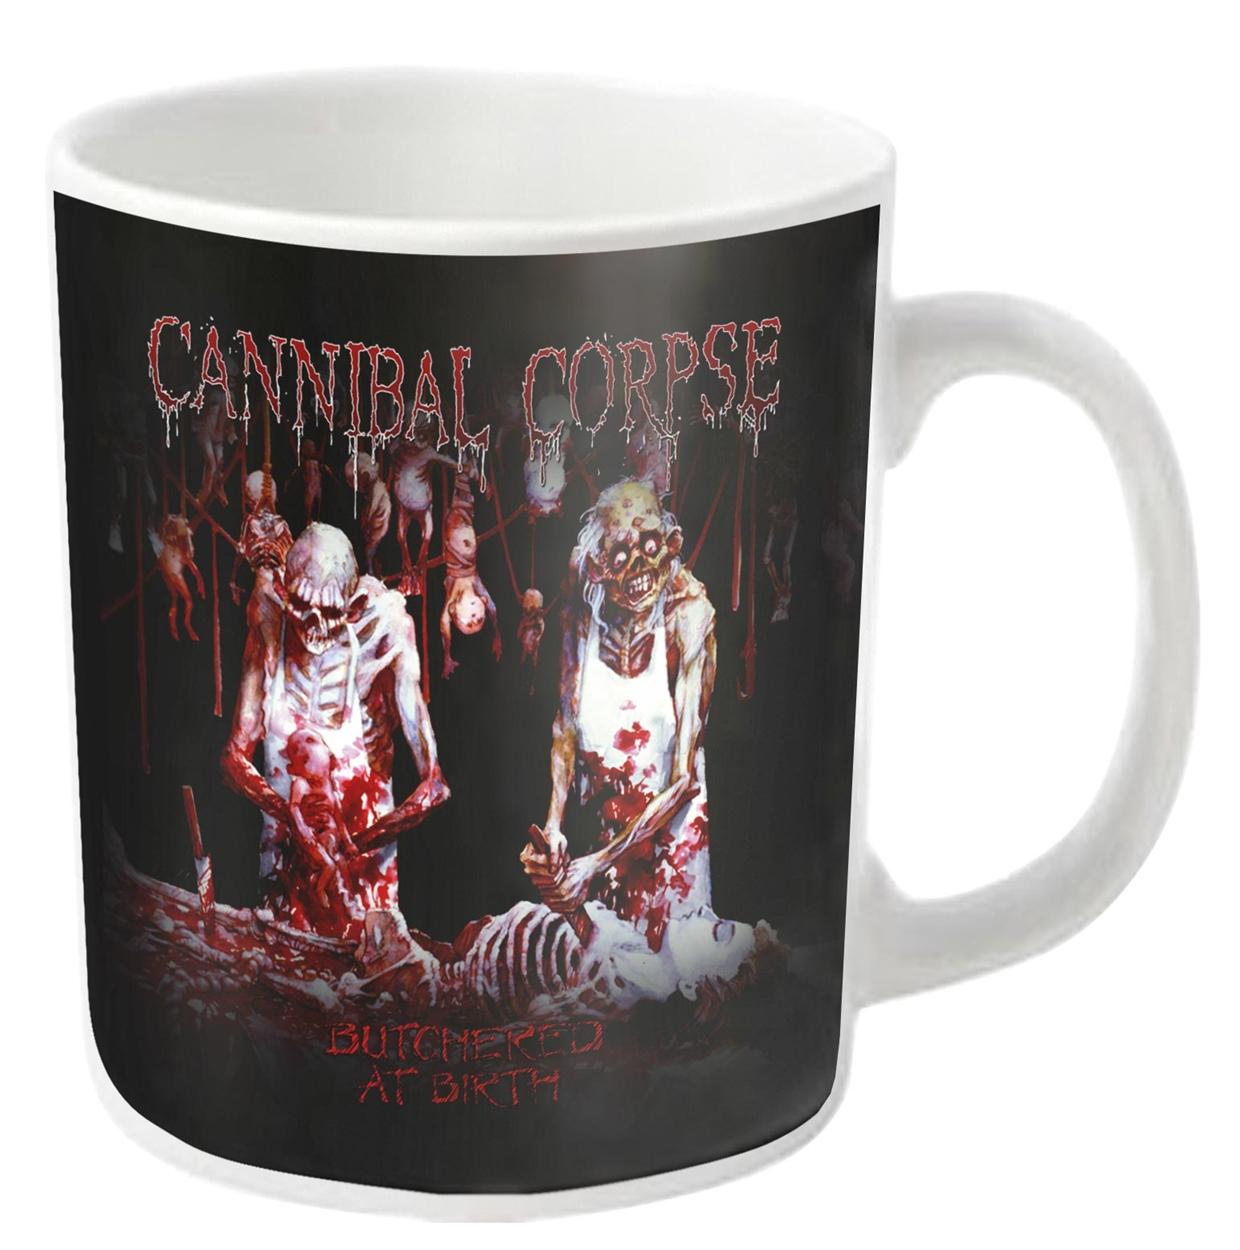 Hrnčeky Cannibal Corpse